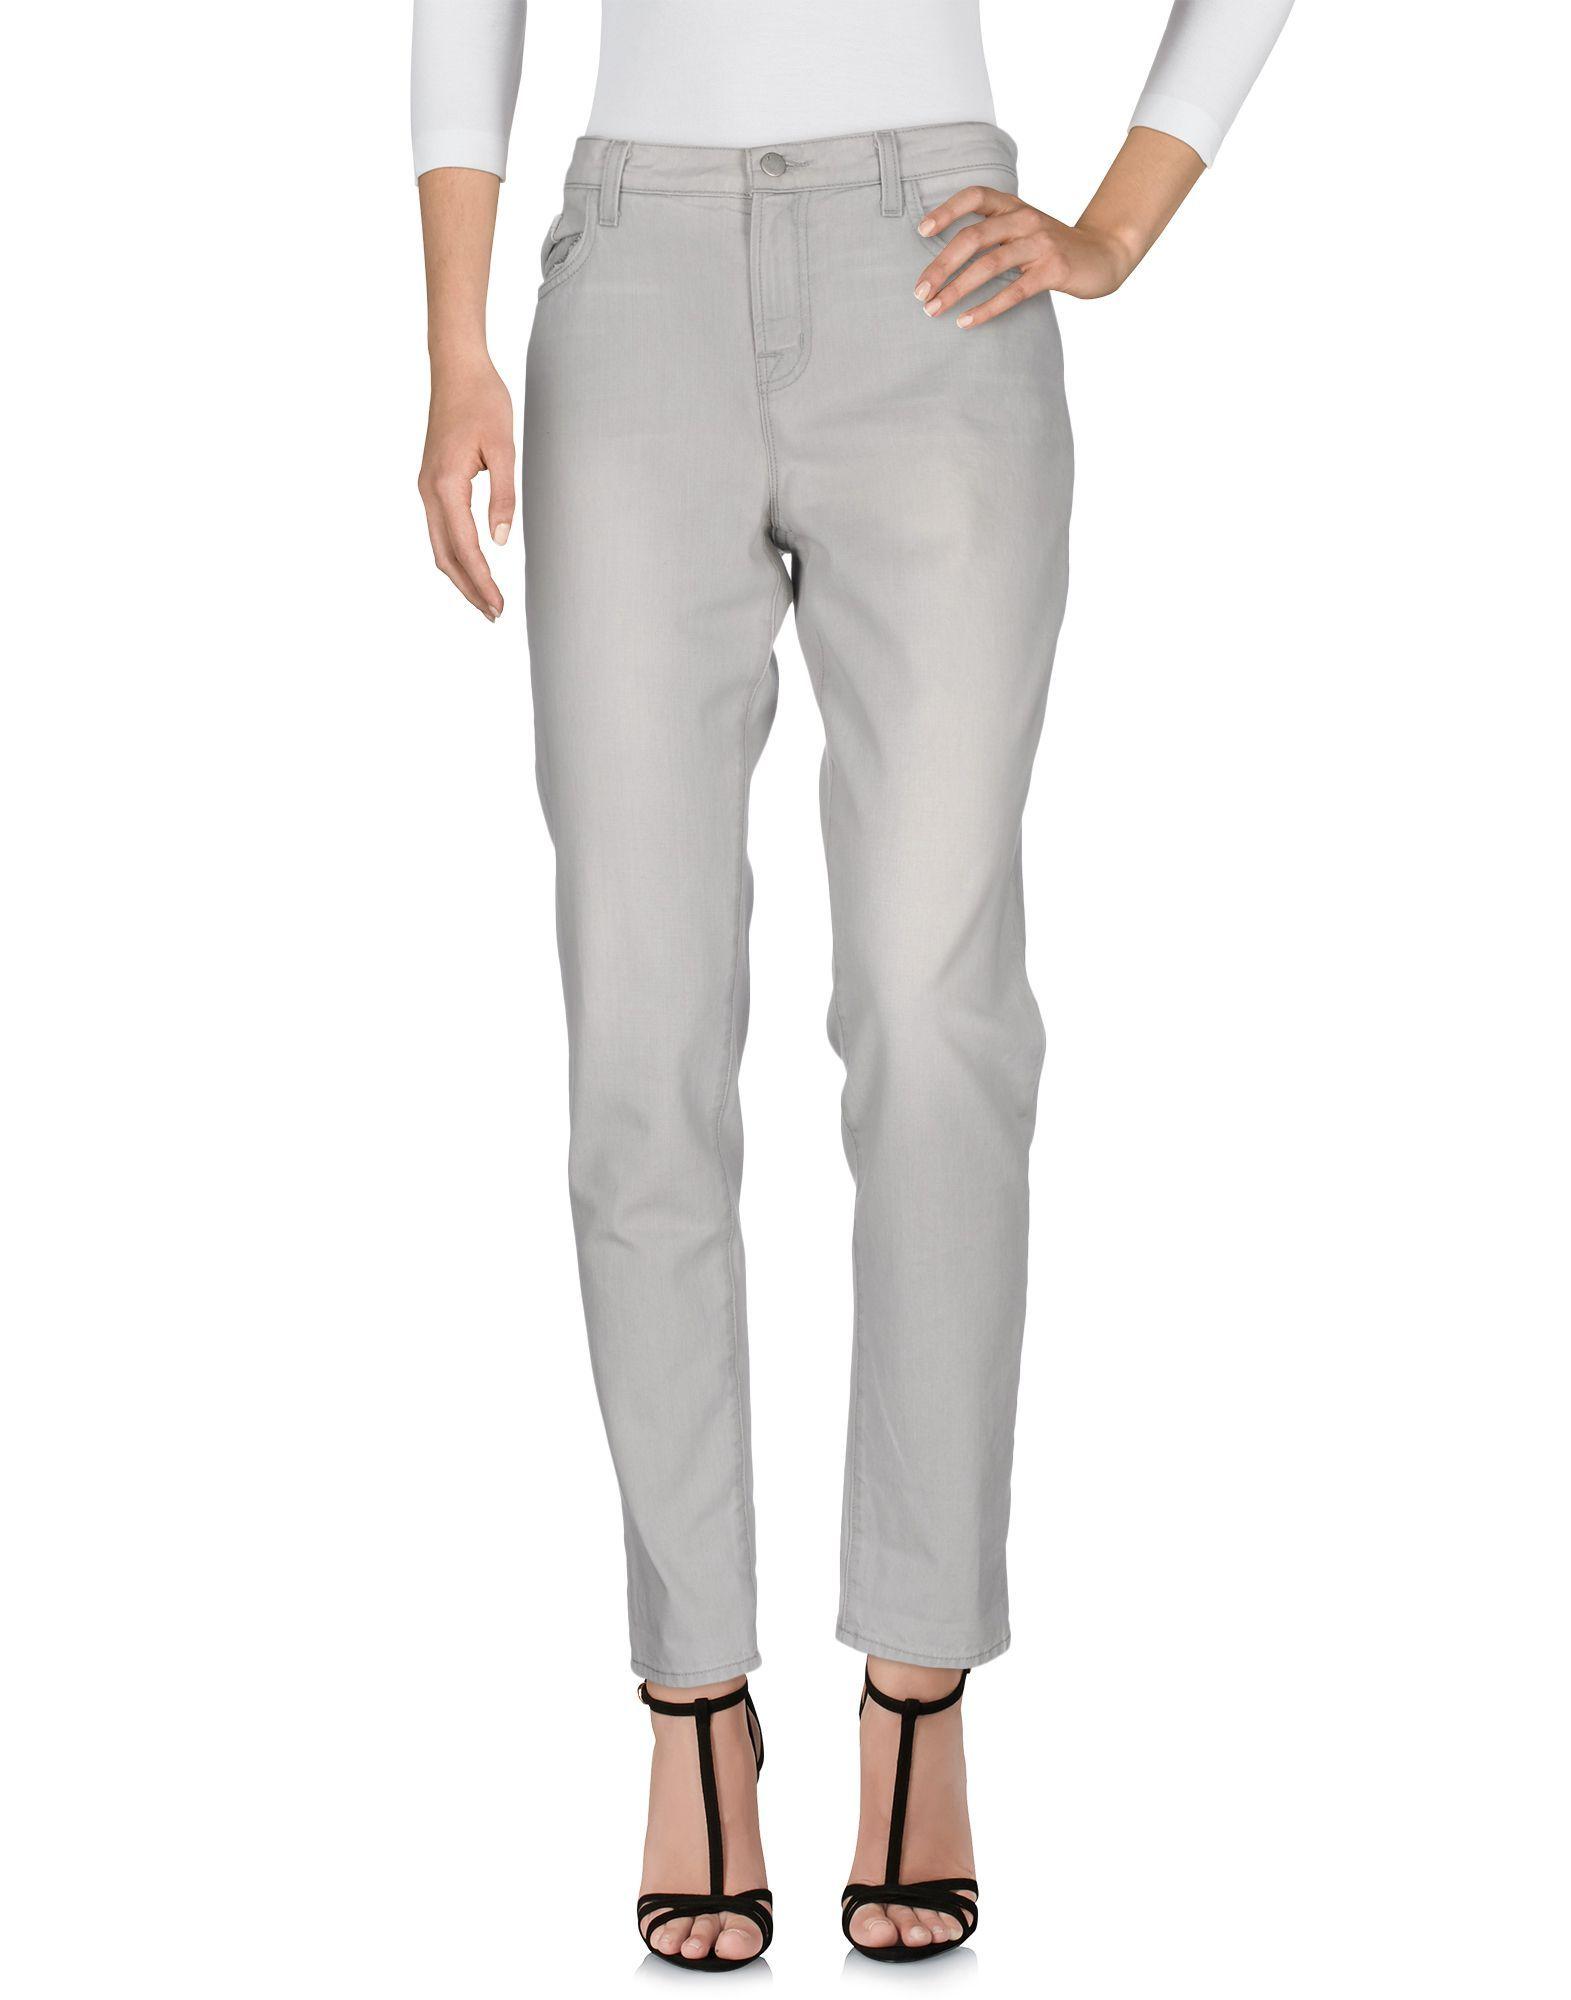 J Brand Light Grey Cotton Straight Leg Jeans